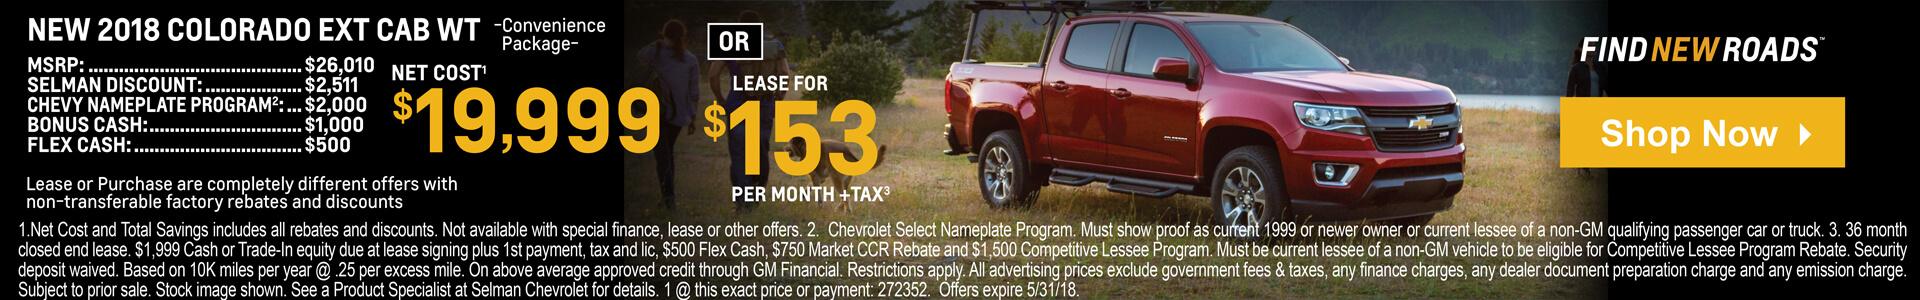 Colorado Extended Cab $19,999